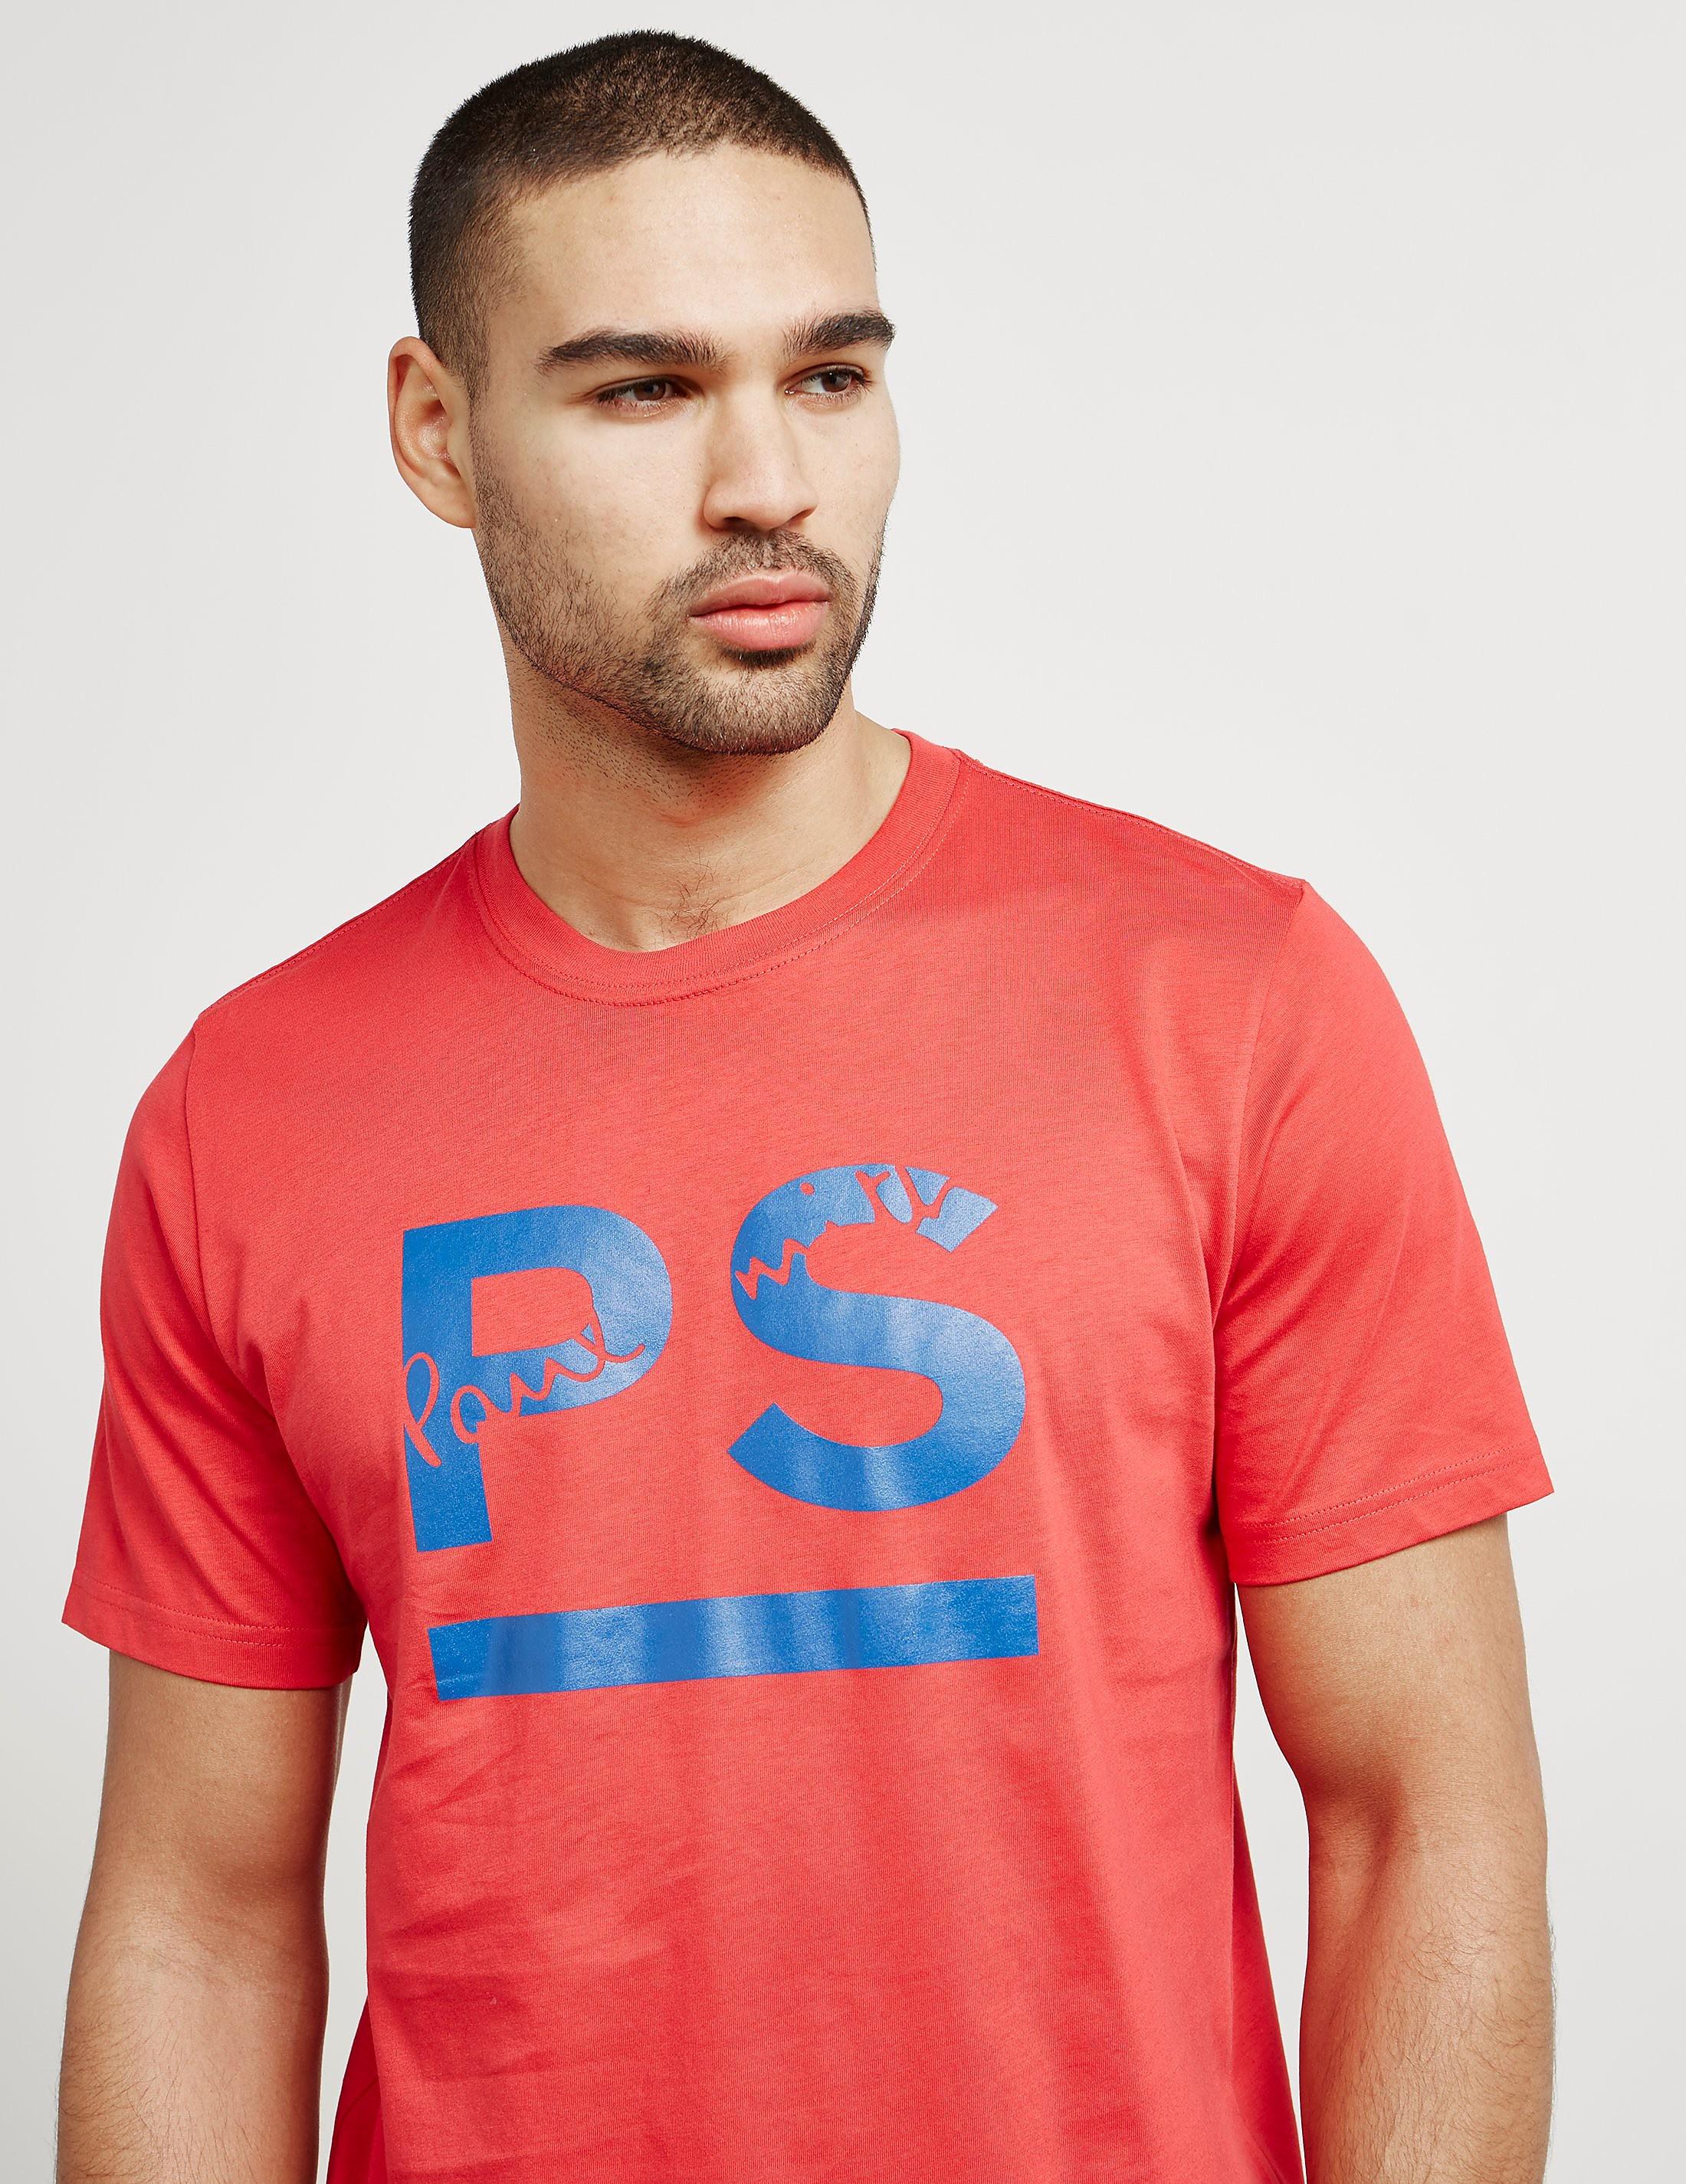 PS Paul Smith Underline Short Sleeve T-Shirt